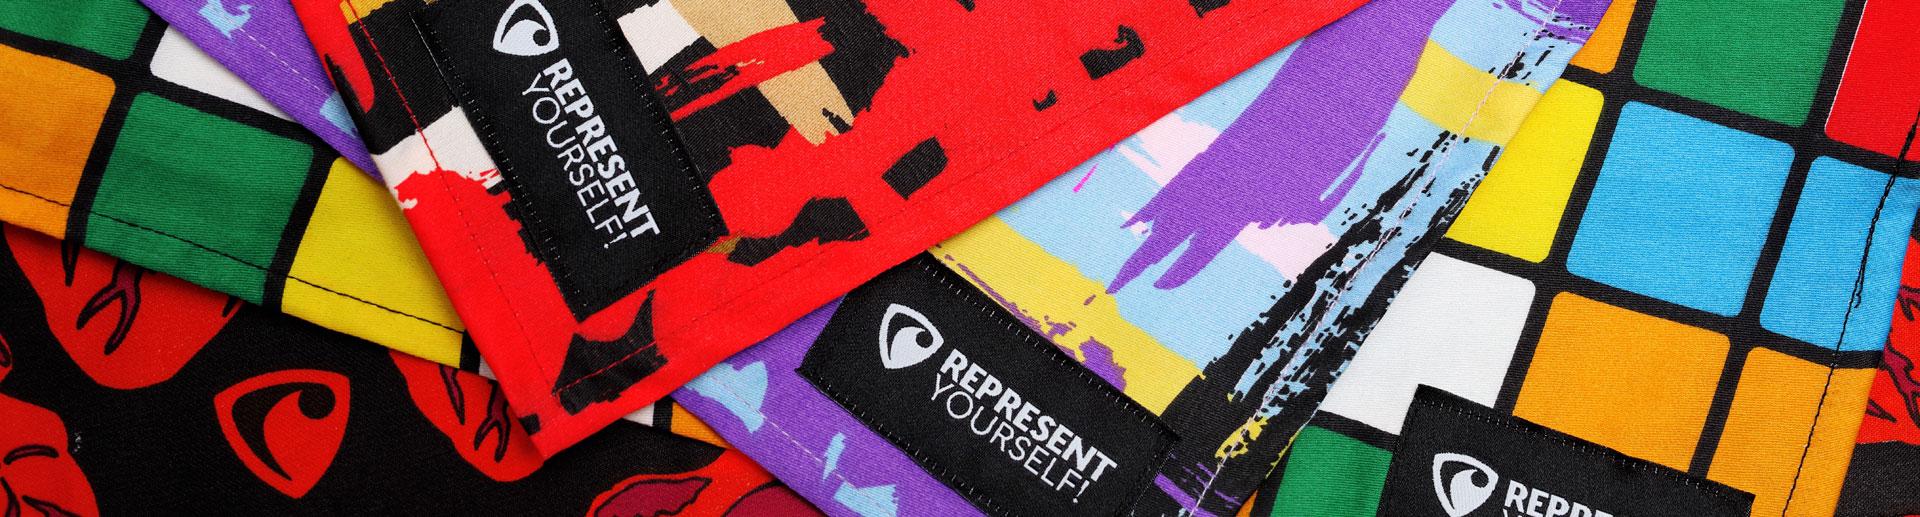 stylové šátky bandana represent